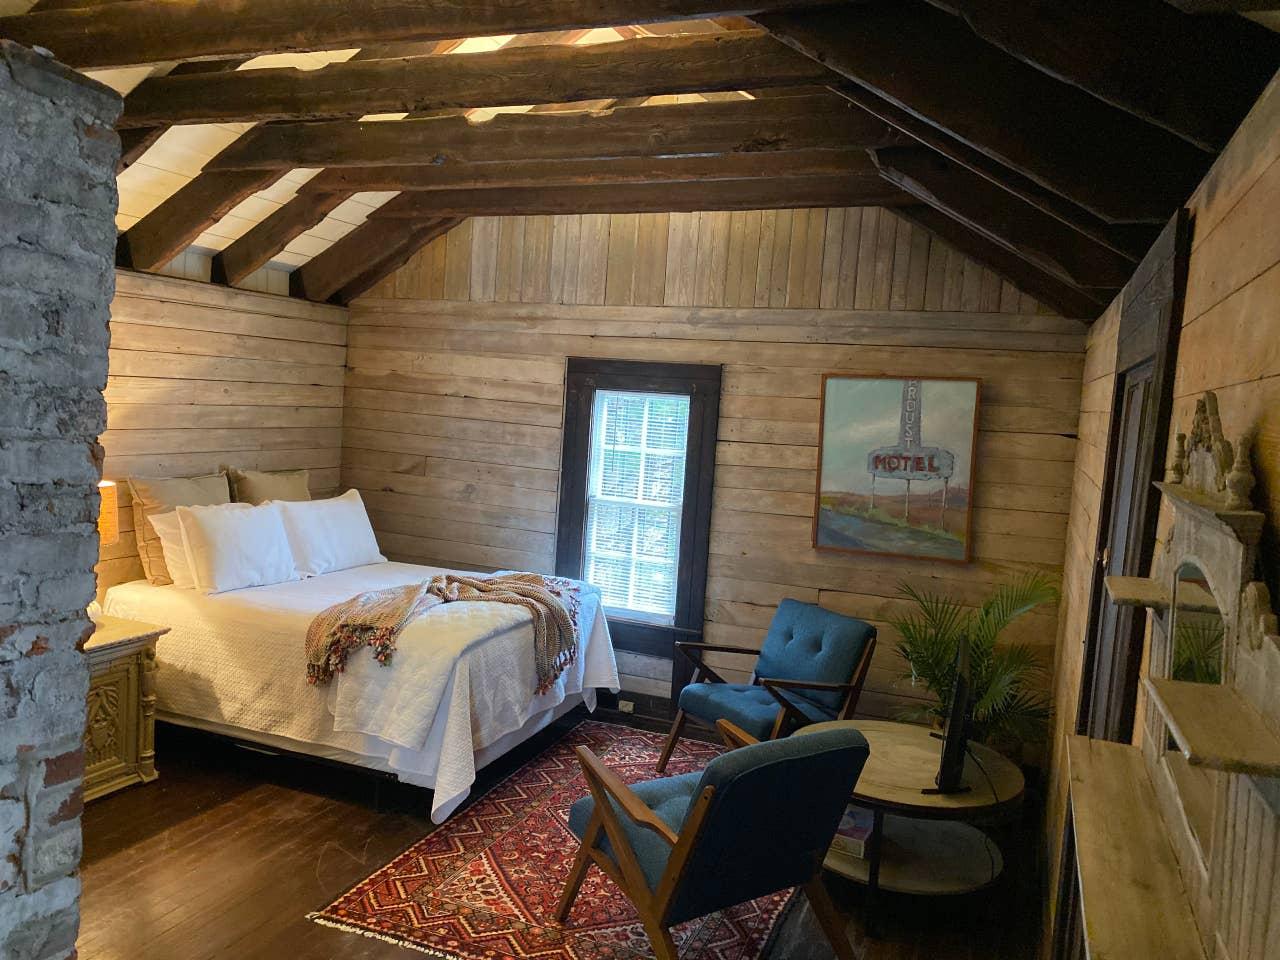 416 Cottage BnB